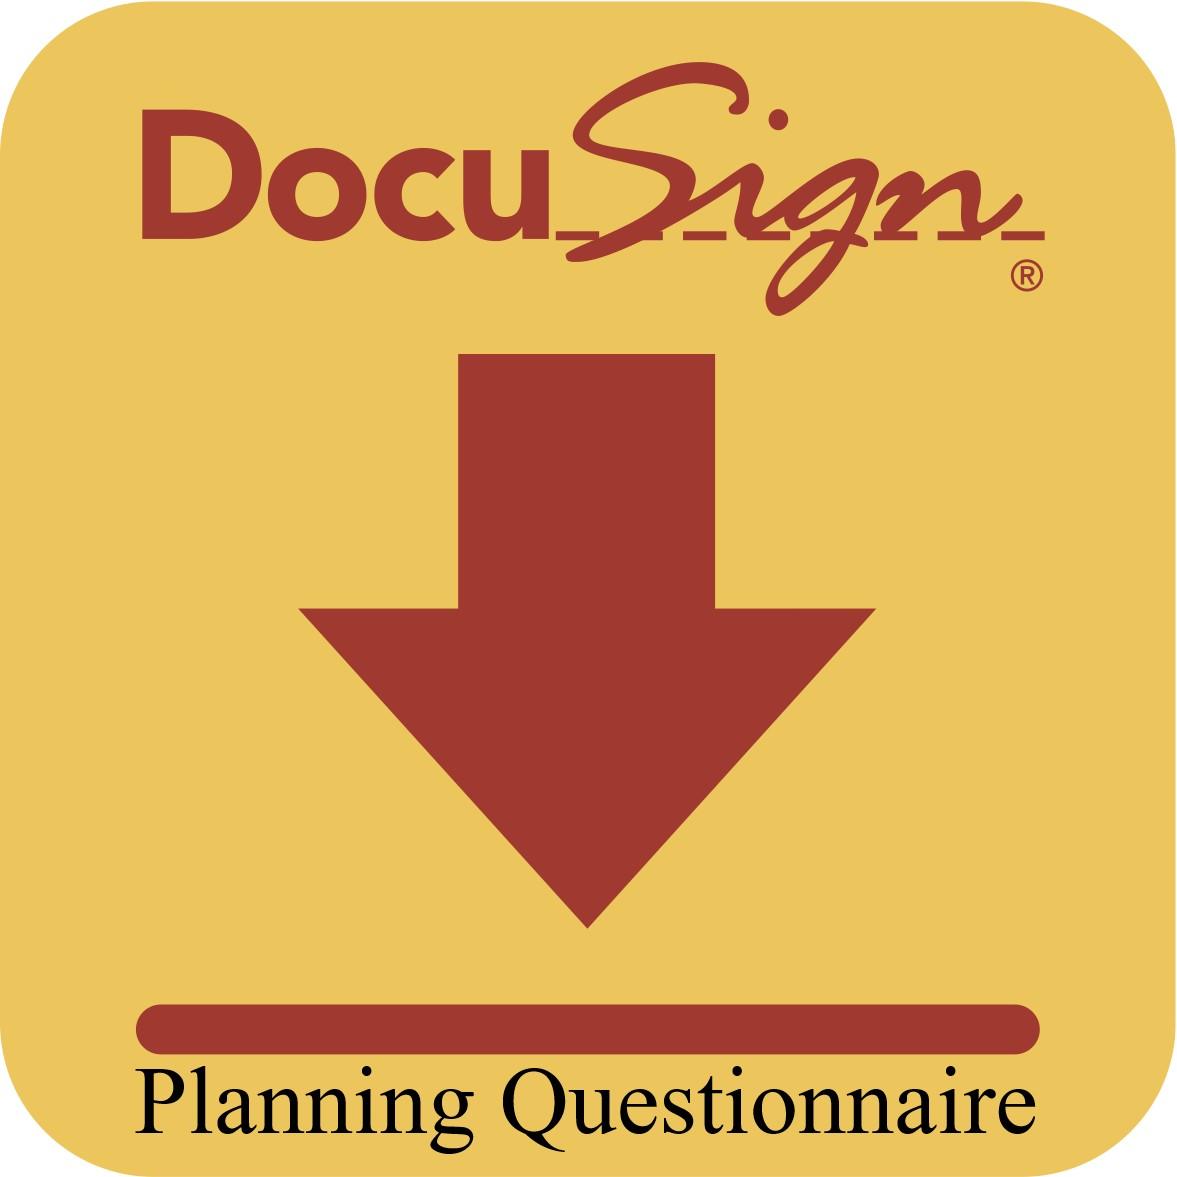 Planning Questionnaire